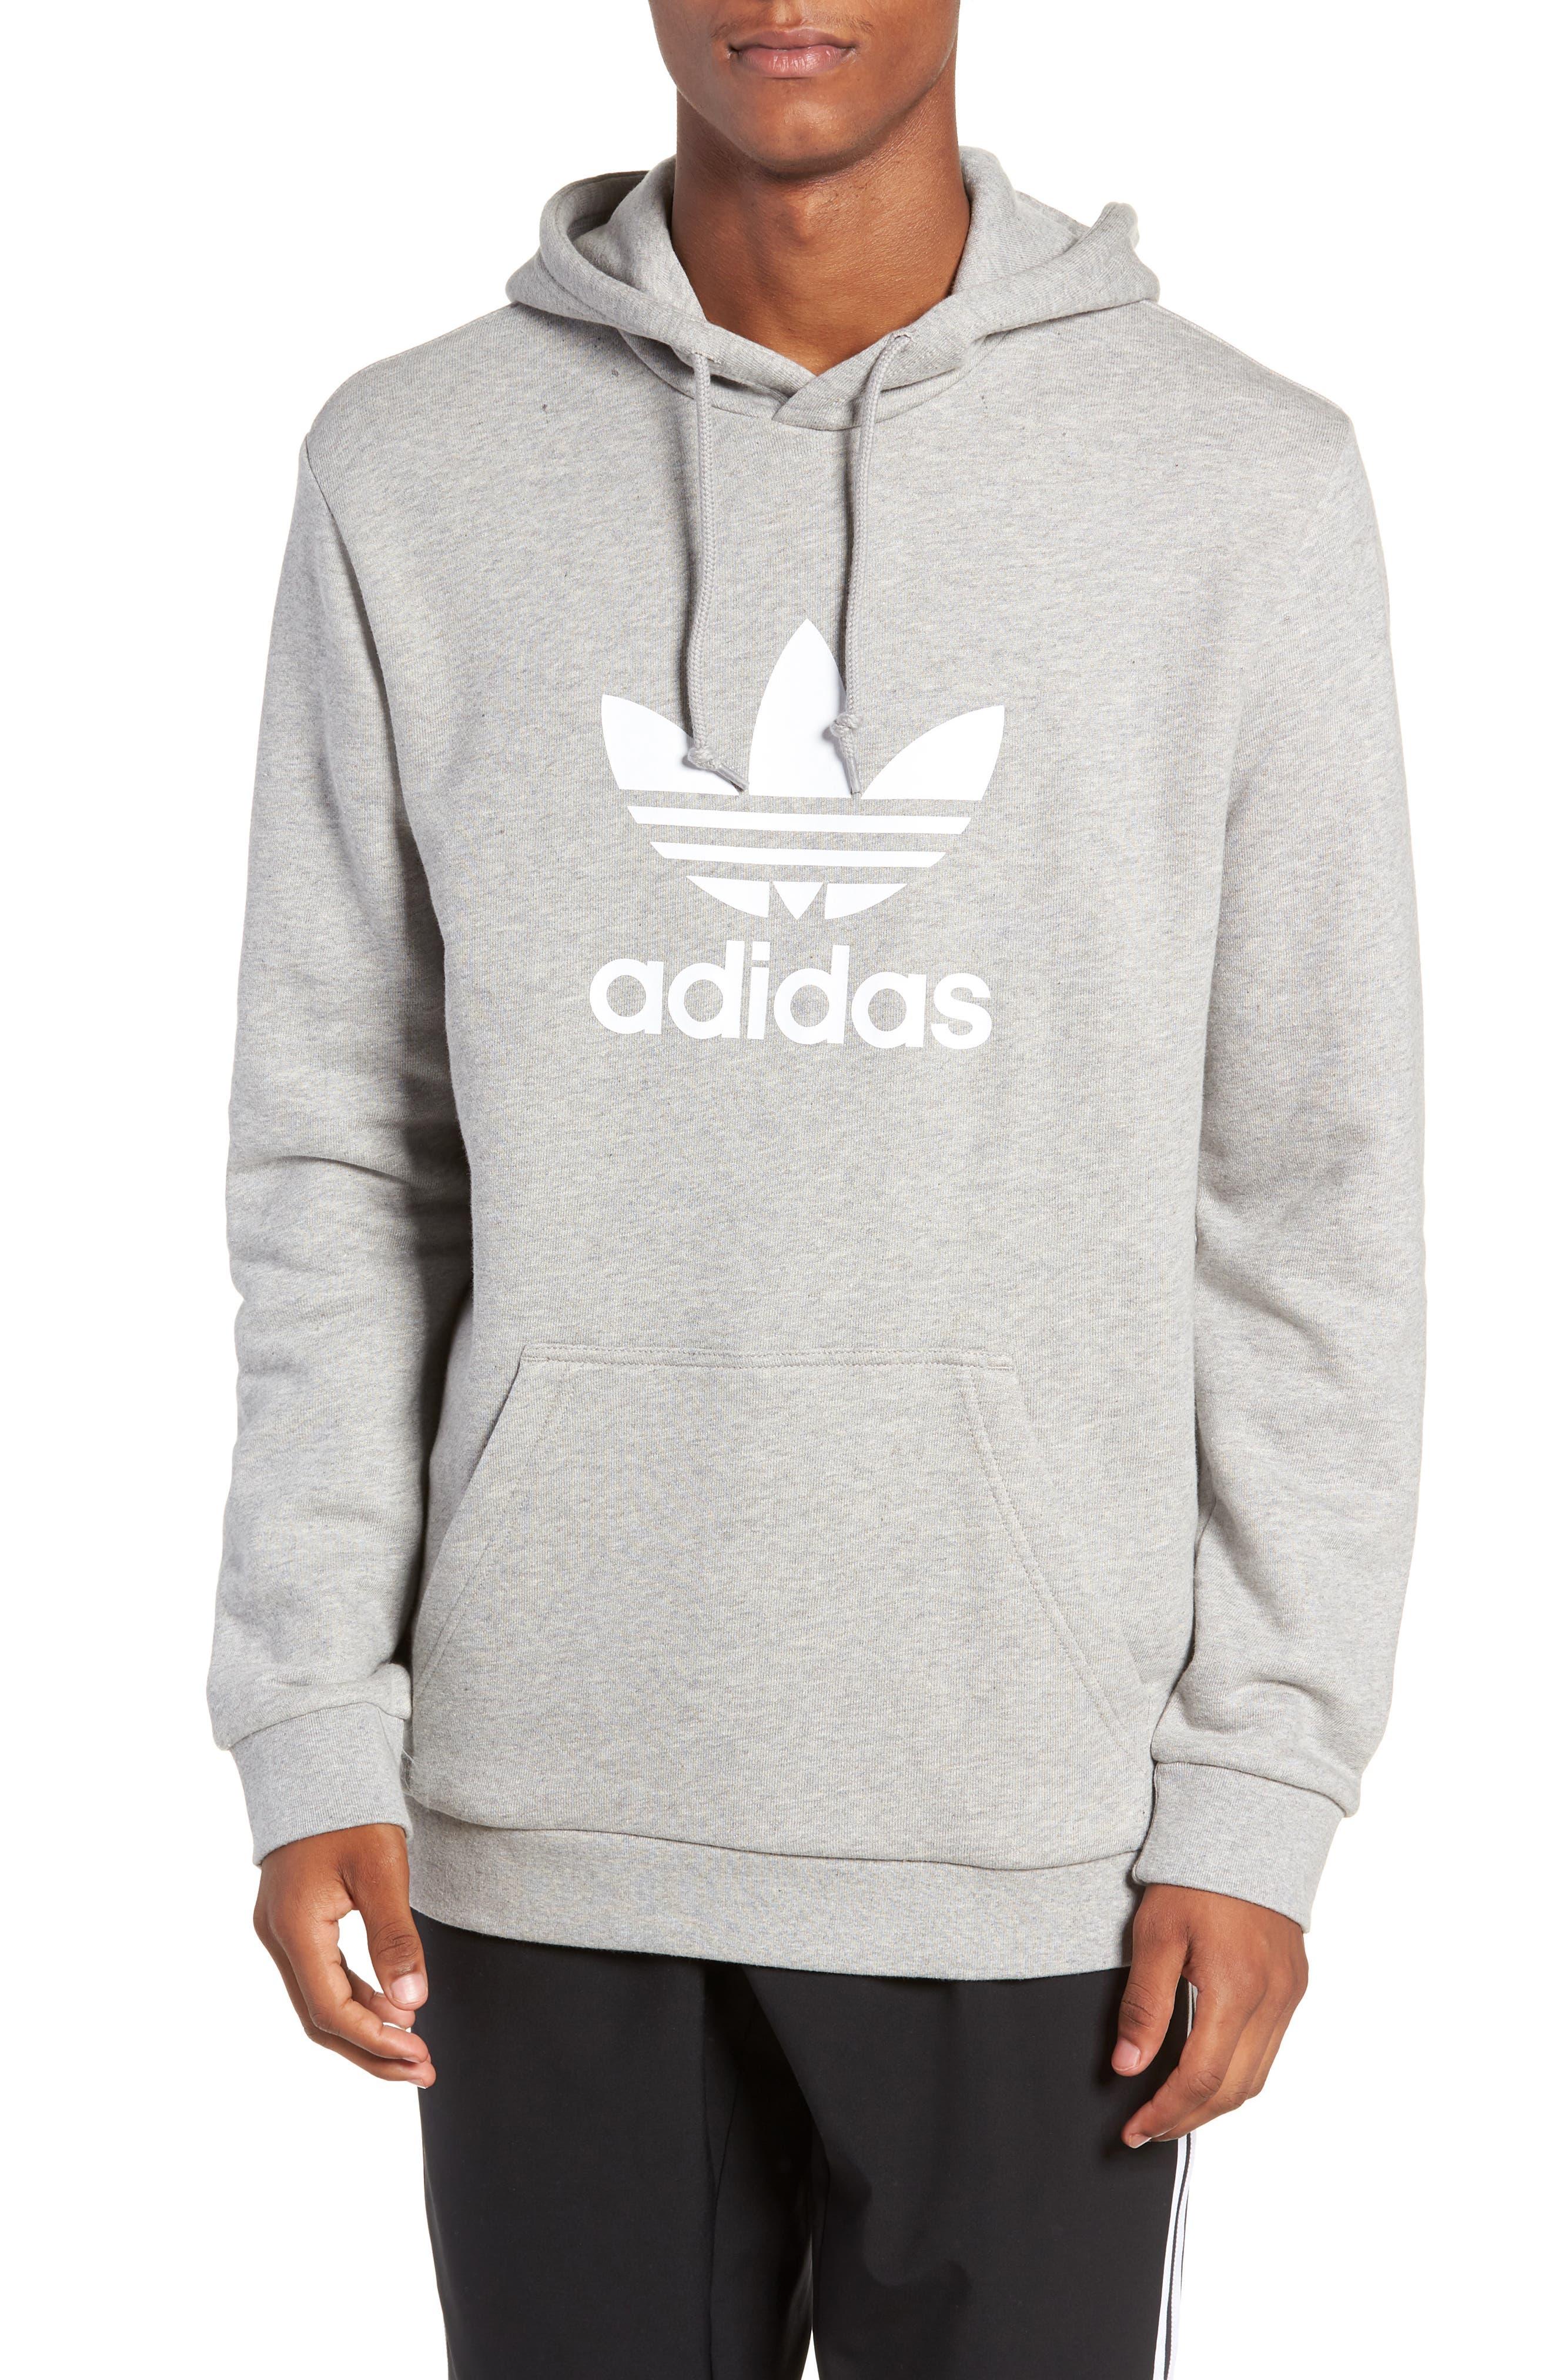 6406b1fd6553 adidas for Men  Activewear